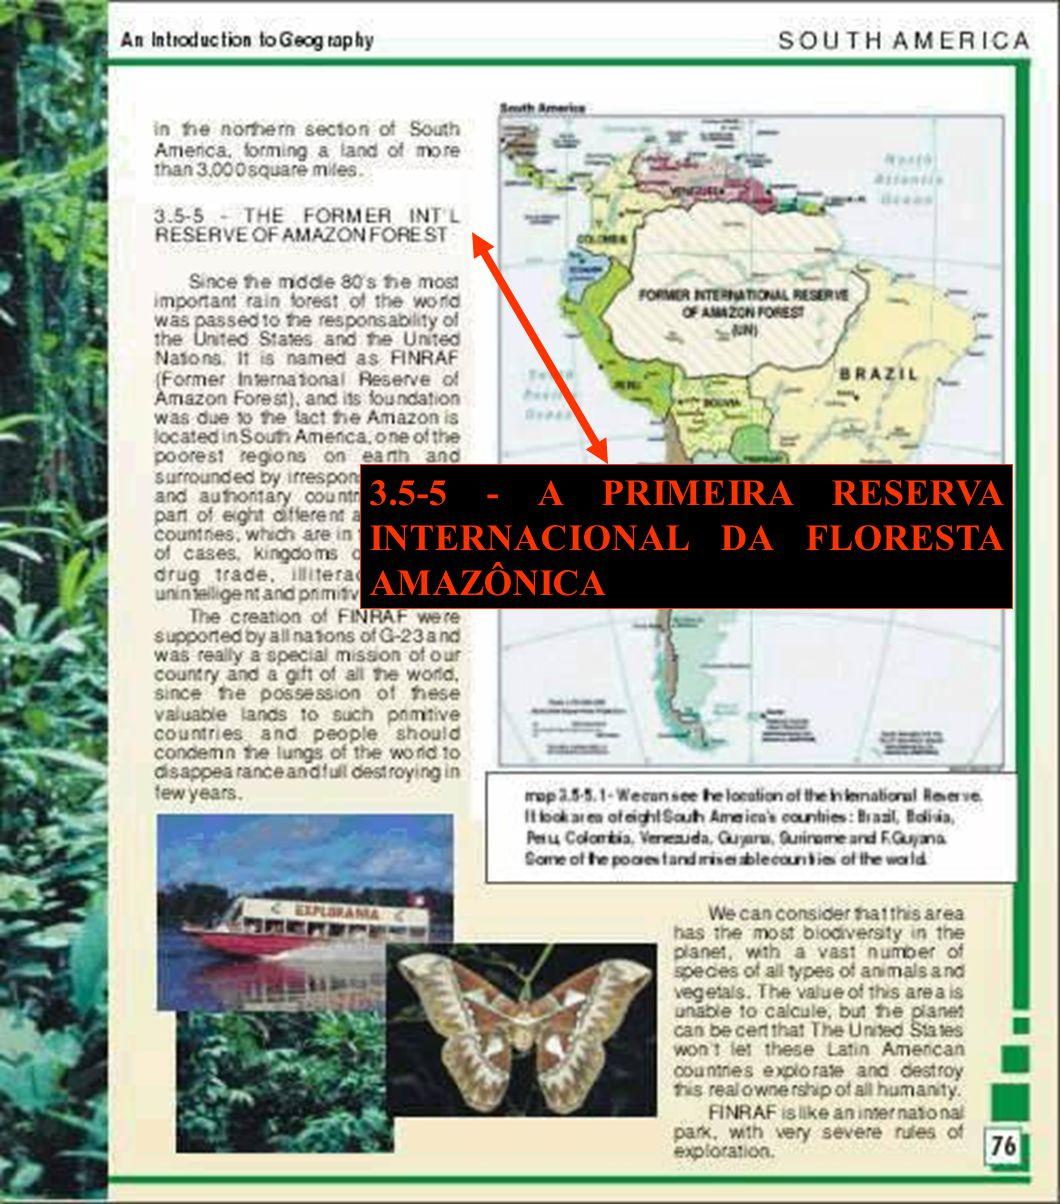 3.5-5 - A PRIMEIRA RESERVA INTERNACIONAL DA FLORESTA AMAZÔNICA